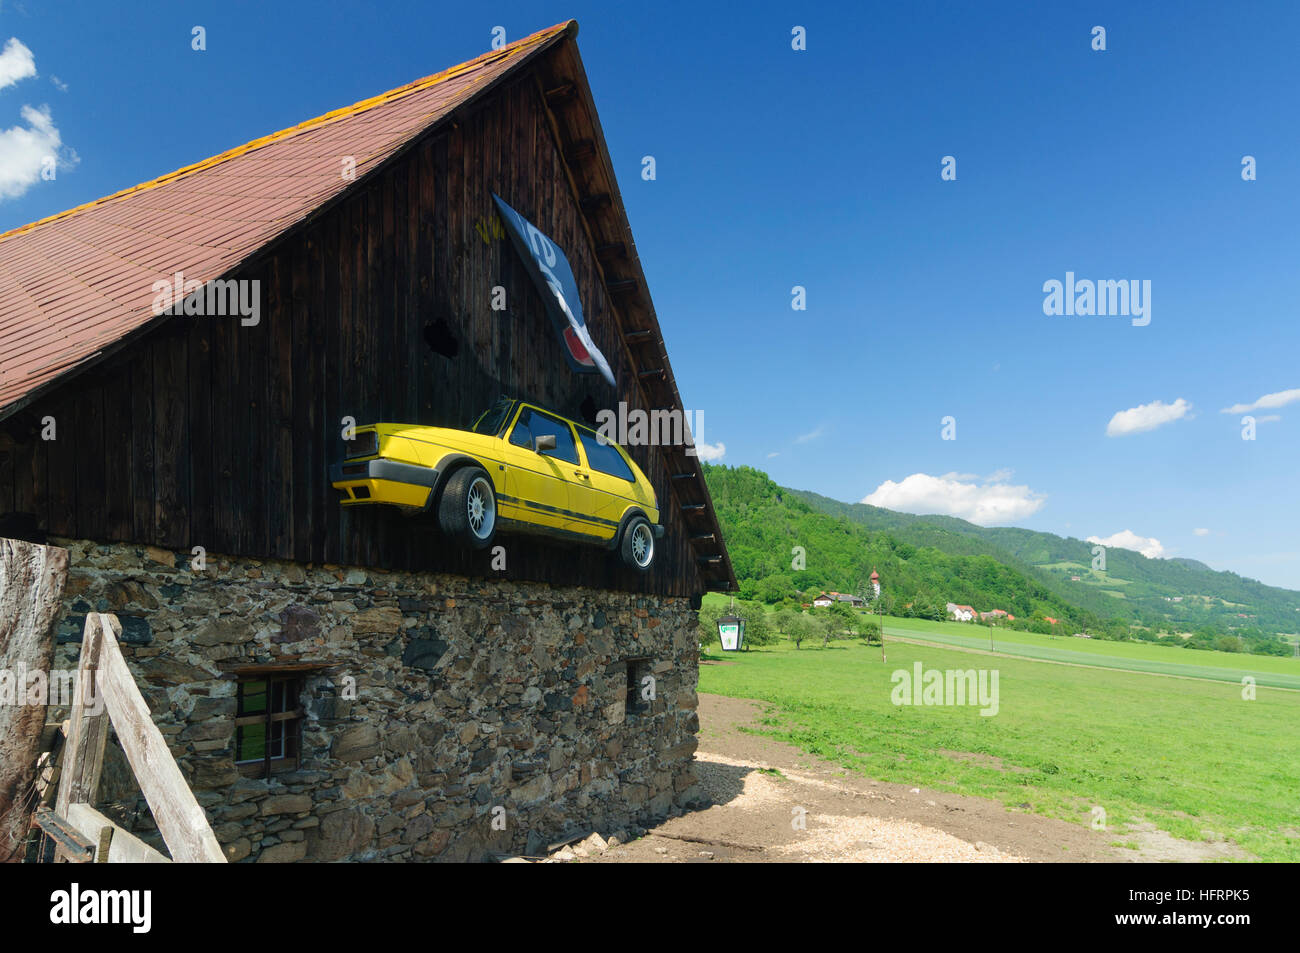 Unzmarkt-Frauenburg: Farmhouse with VW Golf, Murtal, Steiermark, Styria, Austria - Stock Image